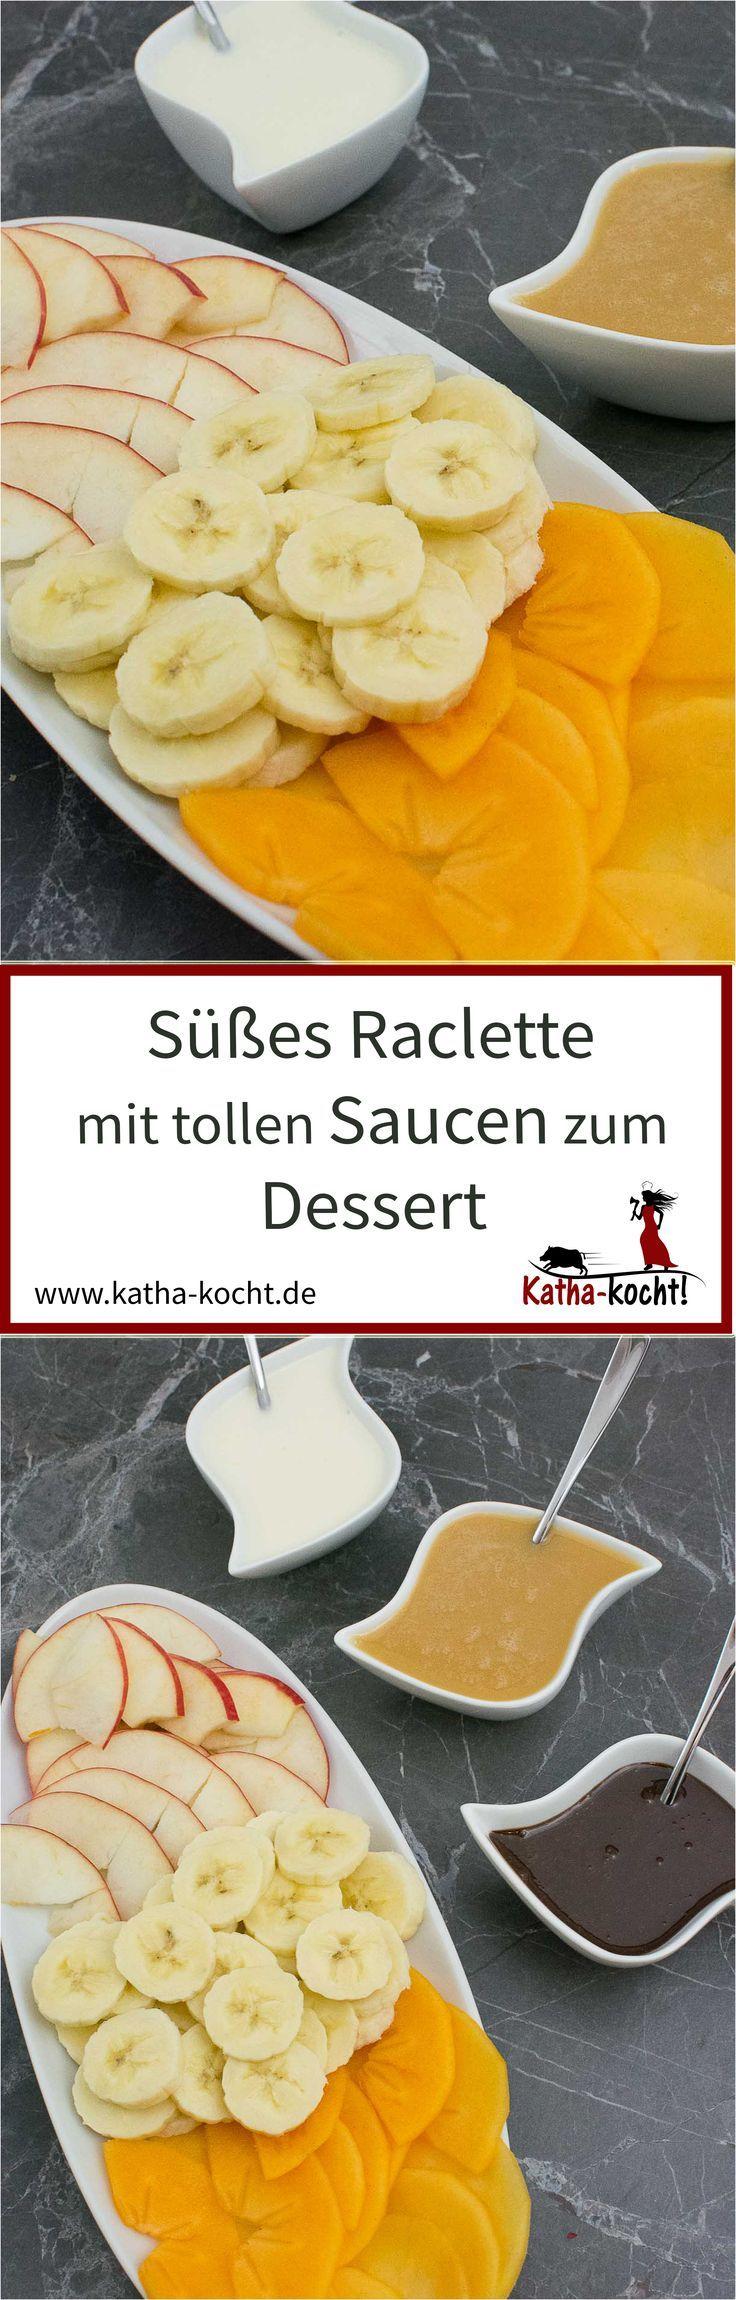 Süßes Raclette zum Dessert #fondue